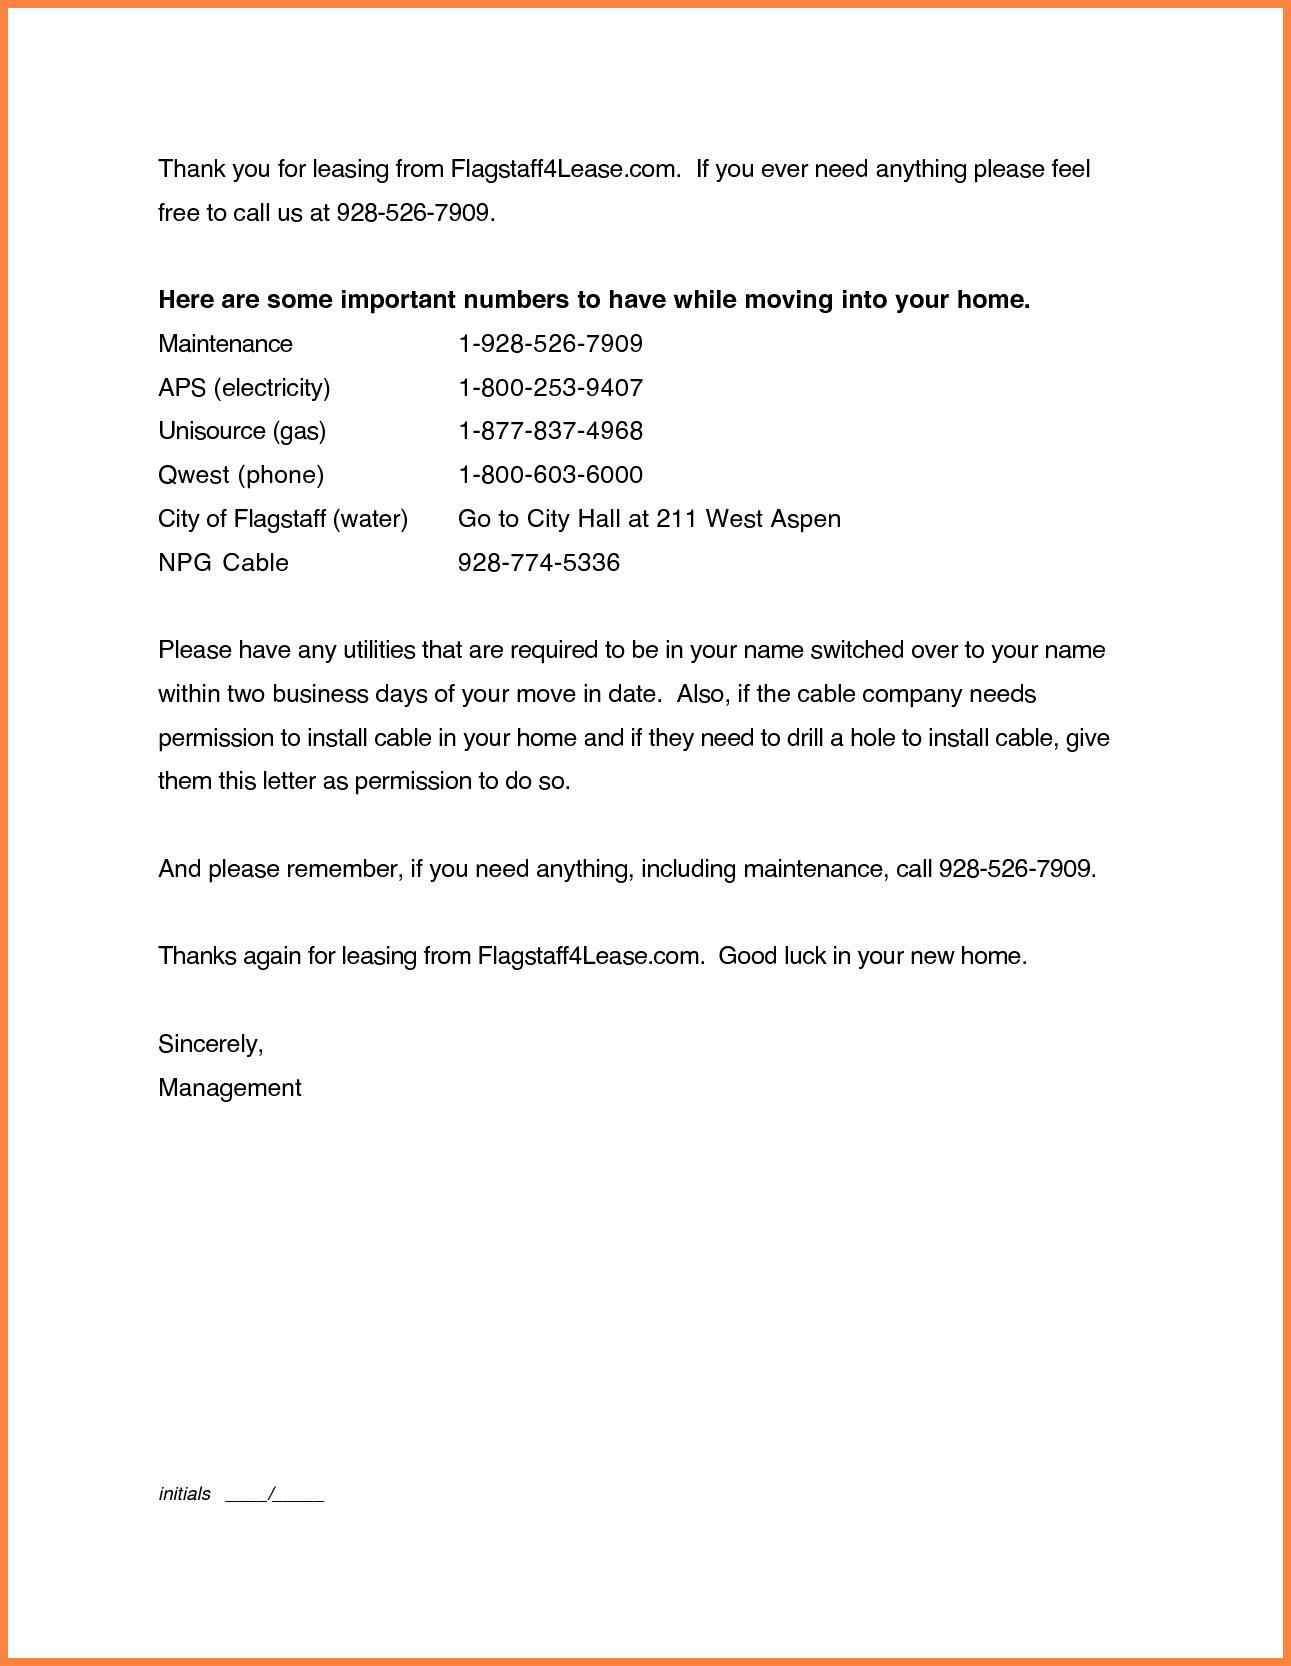 Rental Agreement Termination Letter Inspirational 10 Letter to Terminate Rental Agreement From Landlord